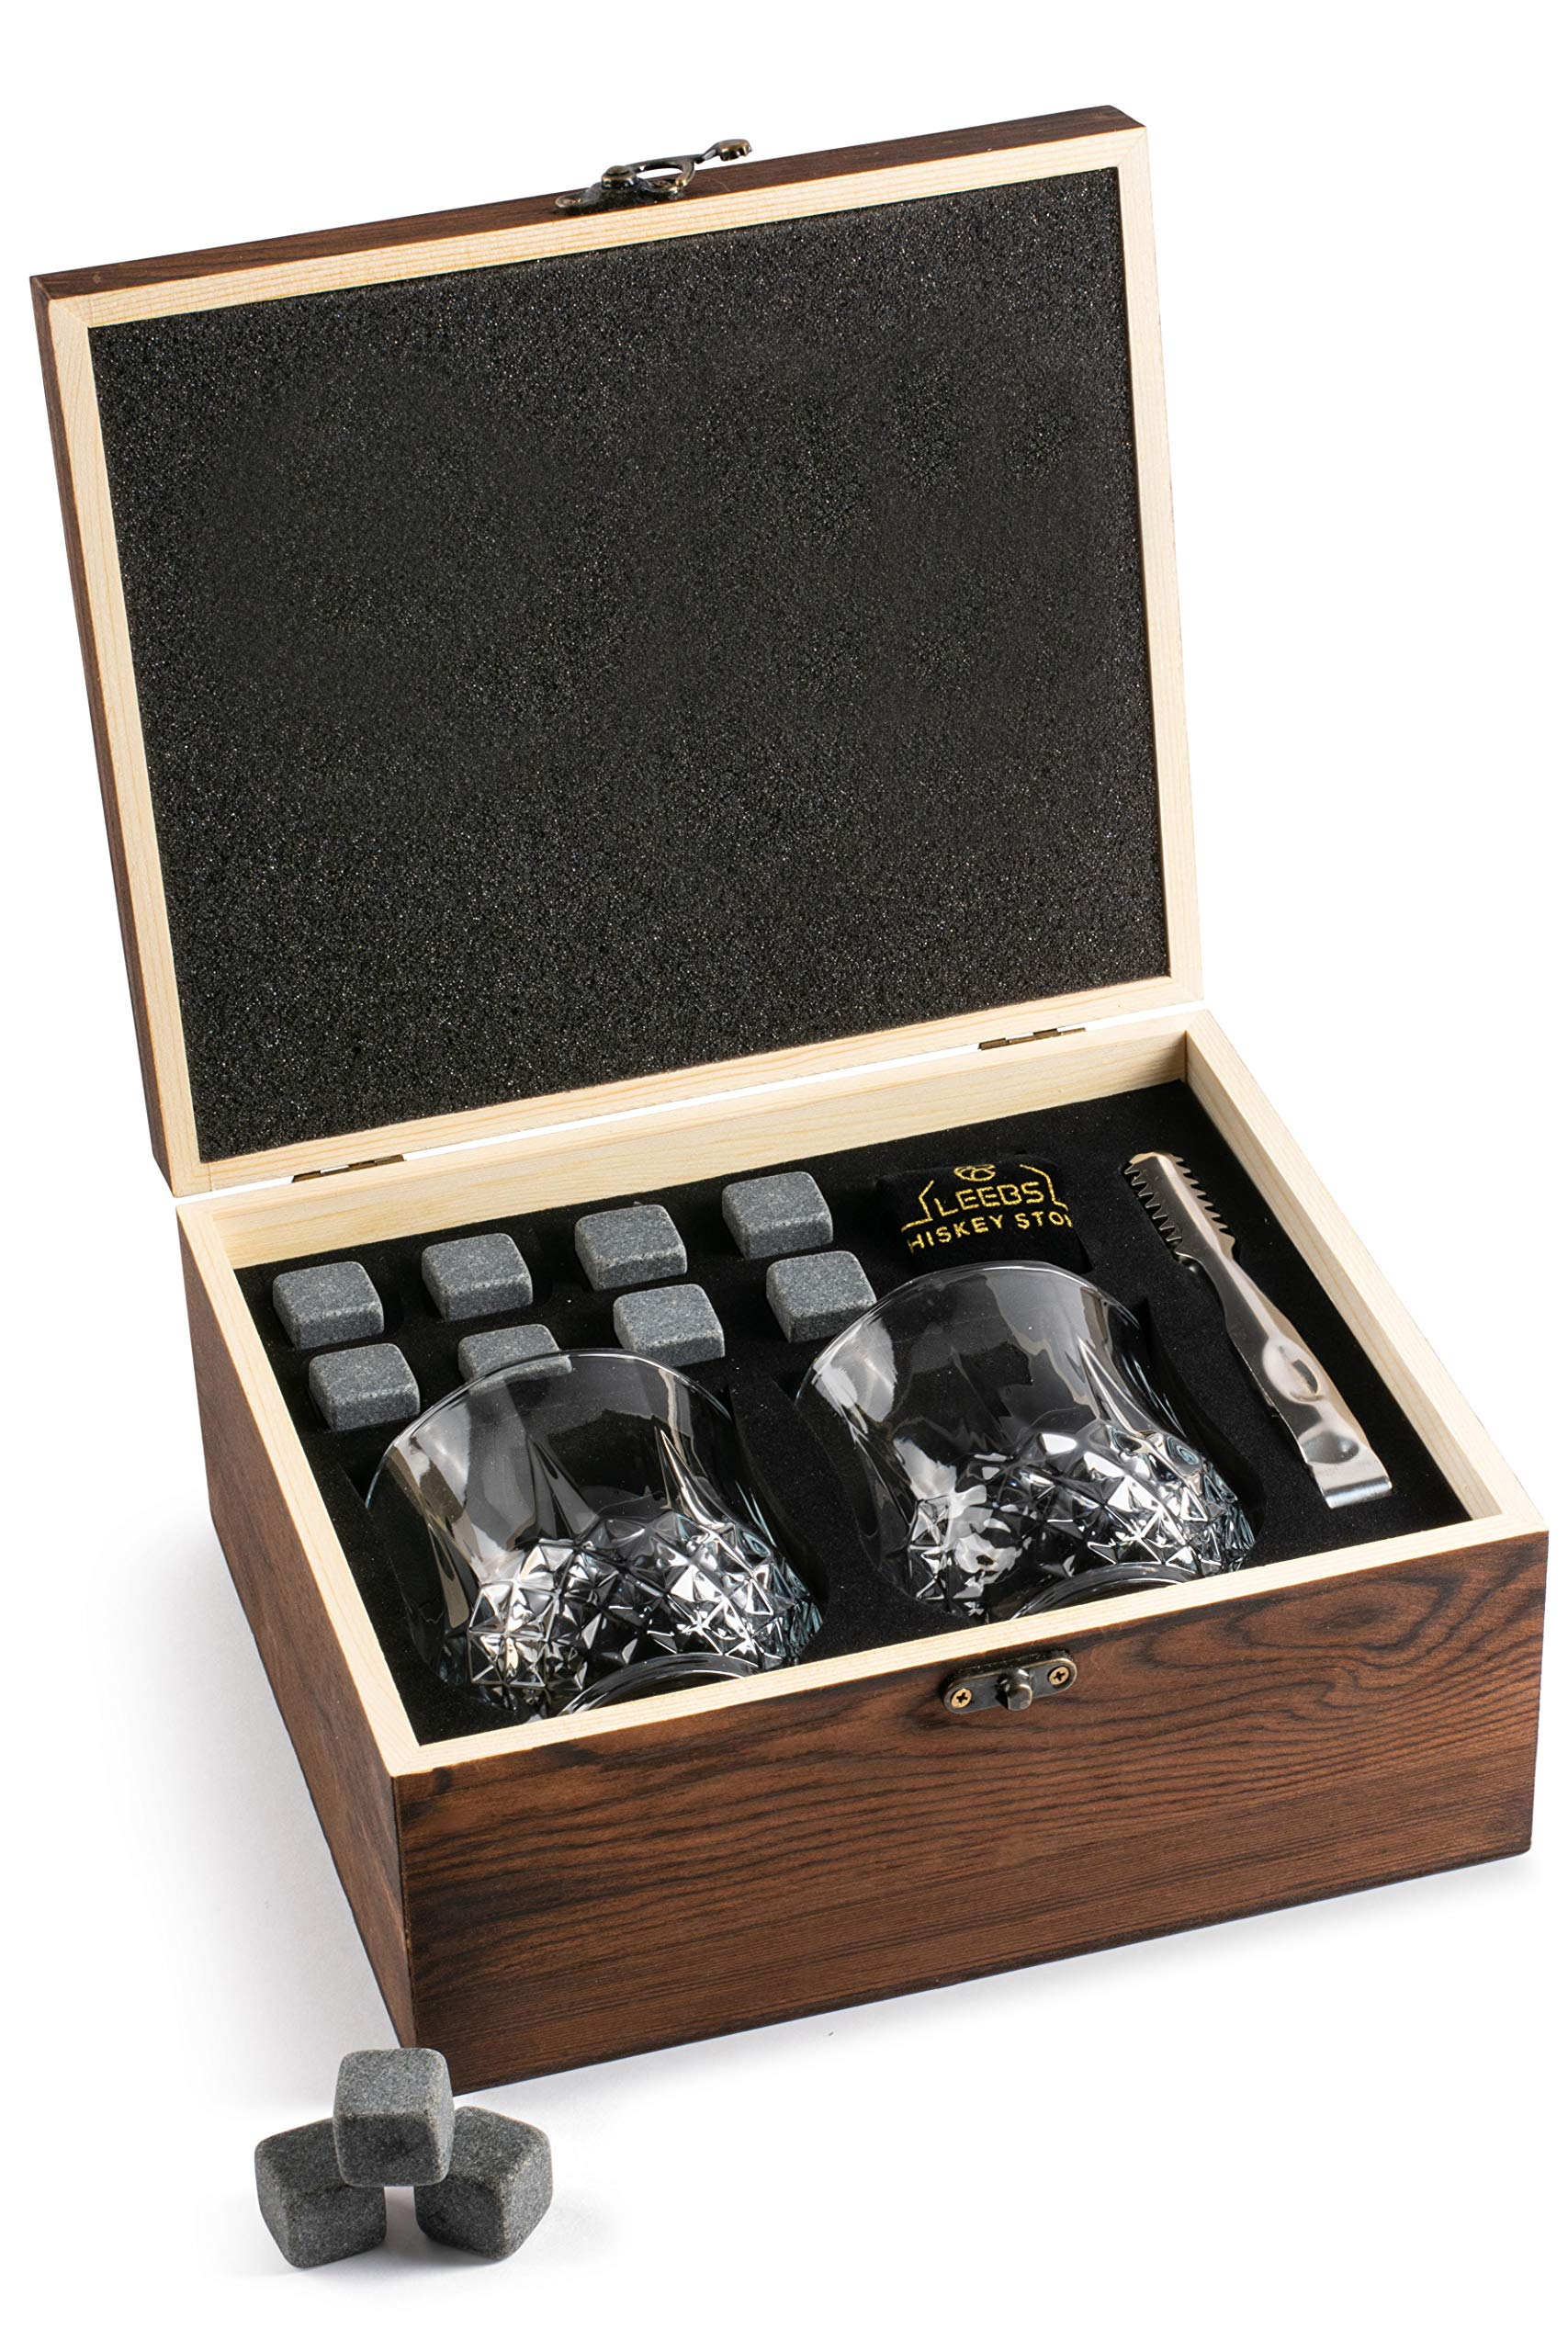 LEEBS Premium Whiskey Stones Gift Set – 2 Large Whiskey Glasses, 8 Granite Scotch Chilling Rocks, Tongs, Velvet Pouch in Elegant Wooden Gift Box Packaging